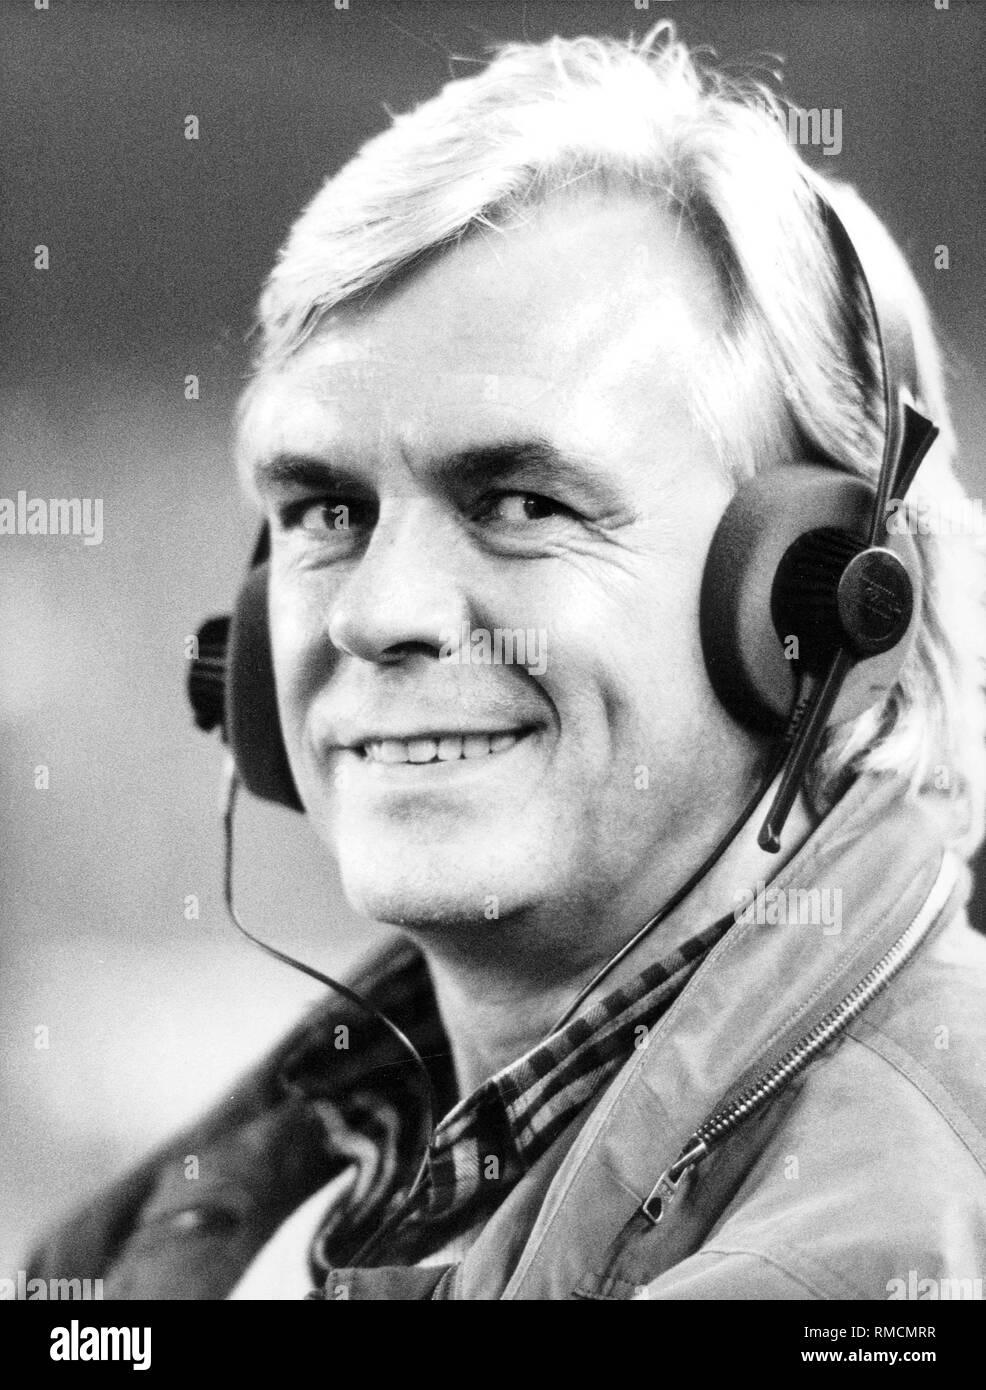 Dieter Kuerten, TV journalist and sports director of ZDF. - Stock Image